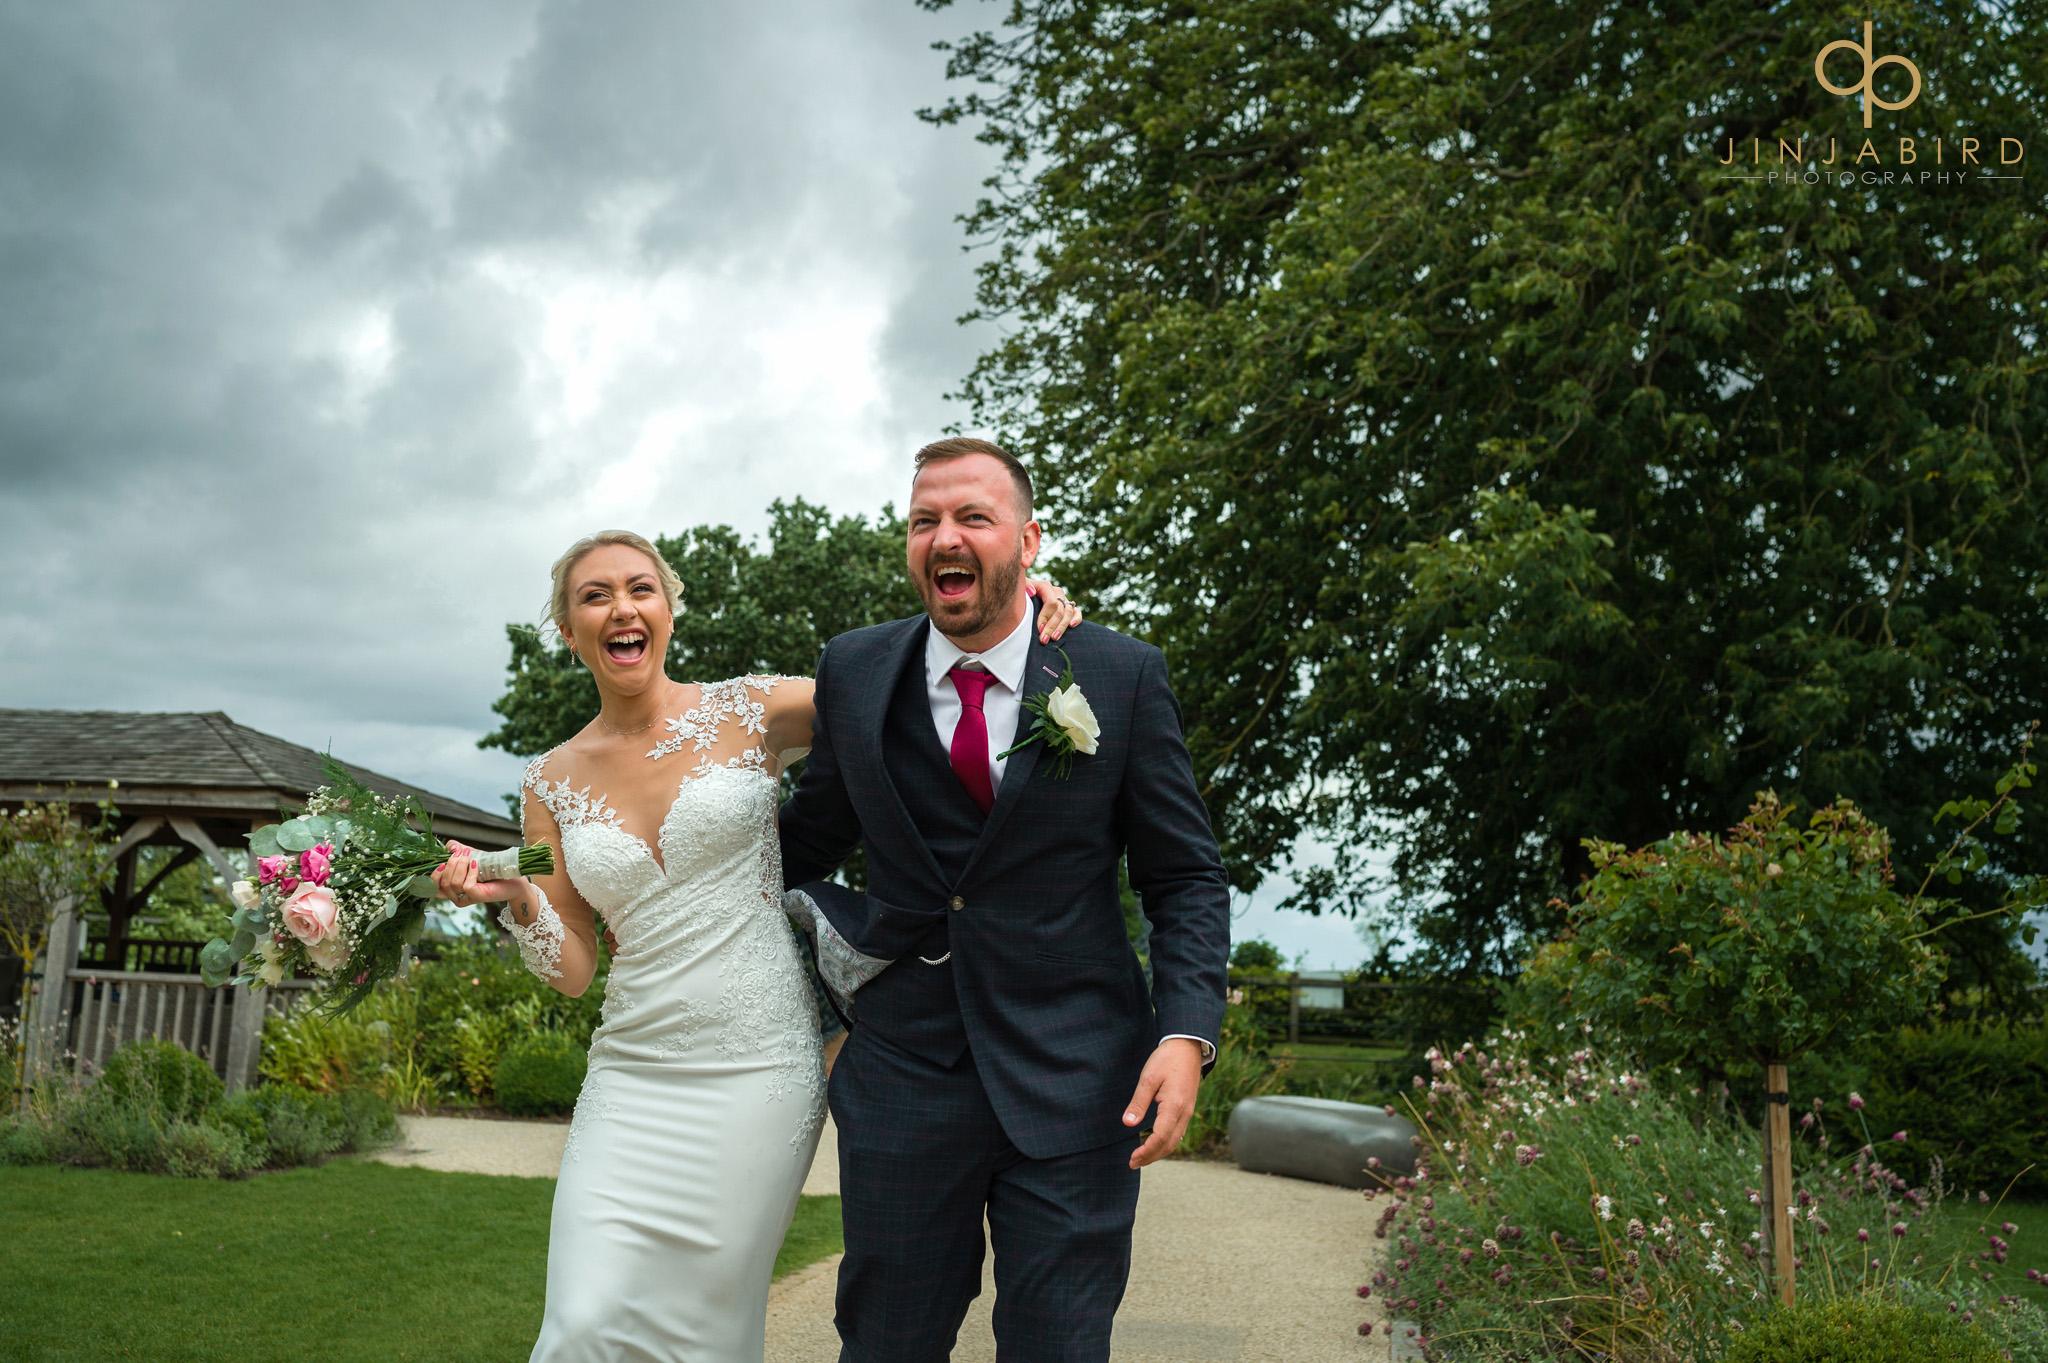 bassmead_manor_august_wedding-37